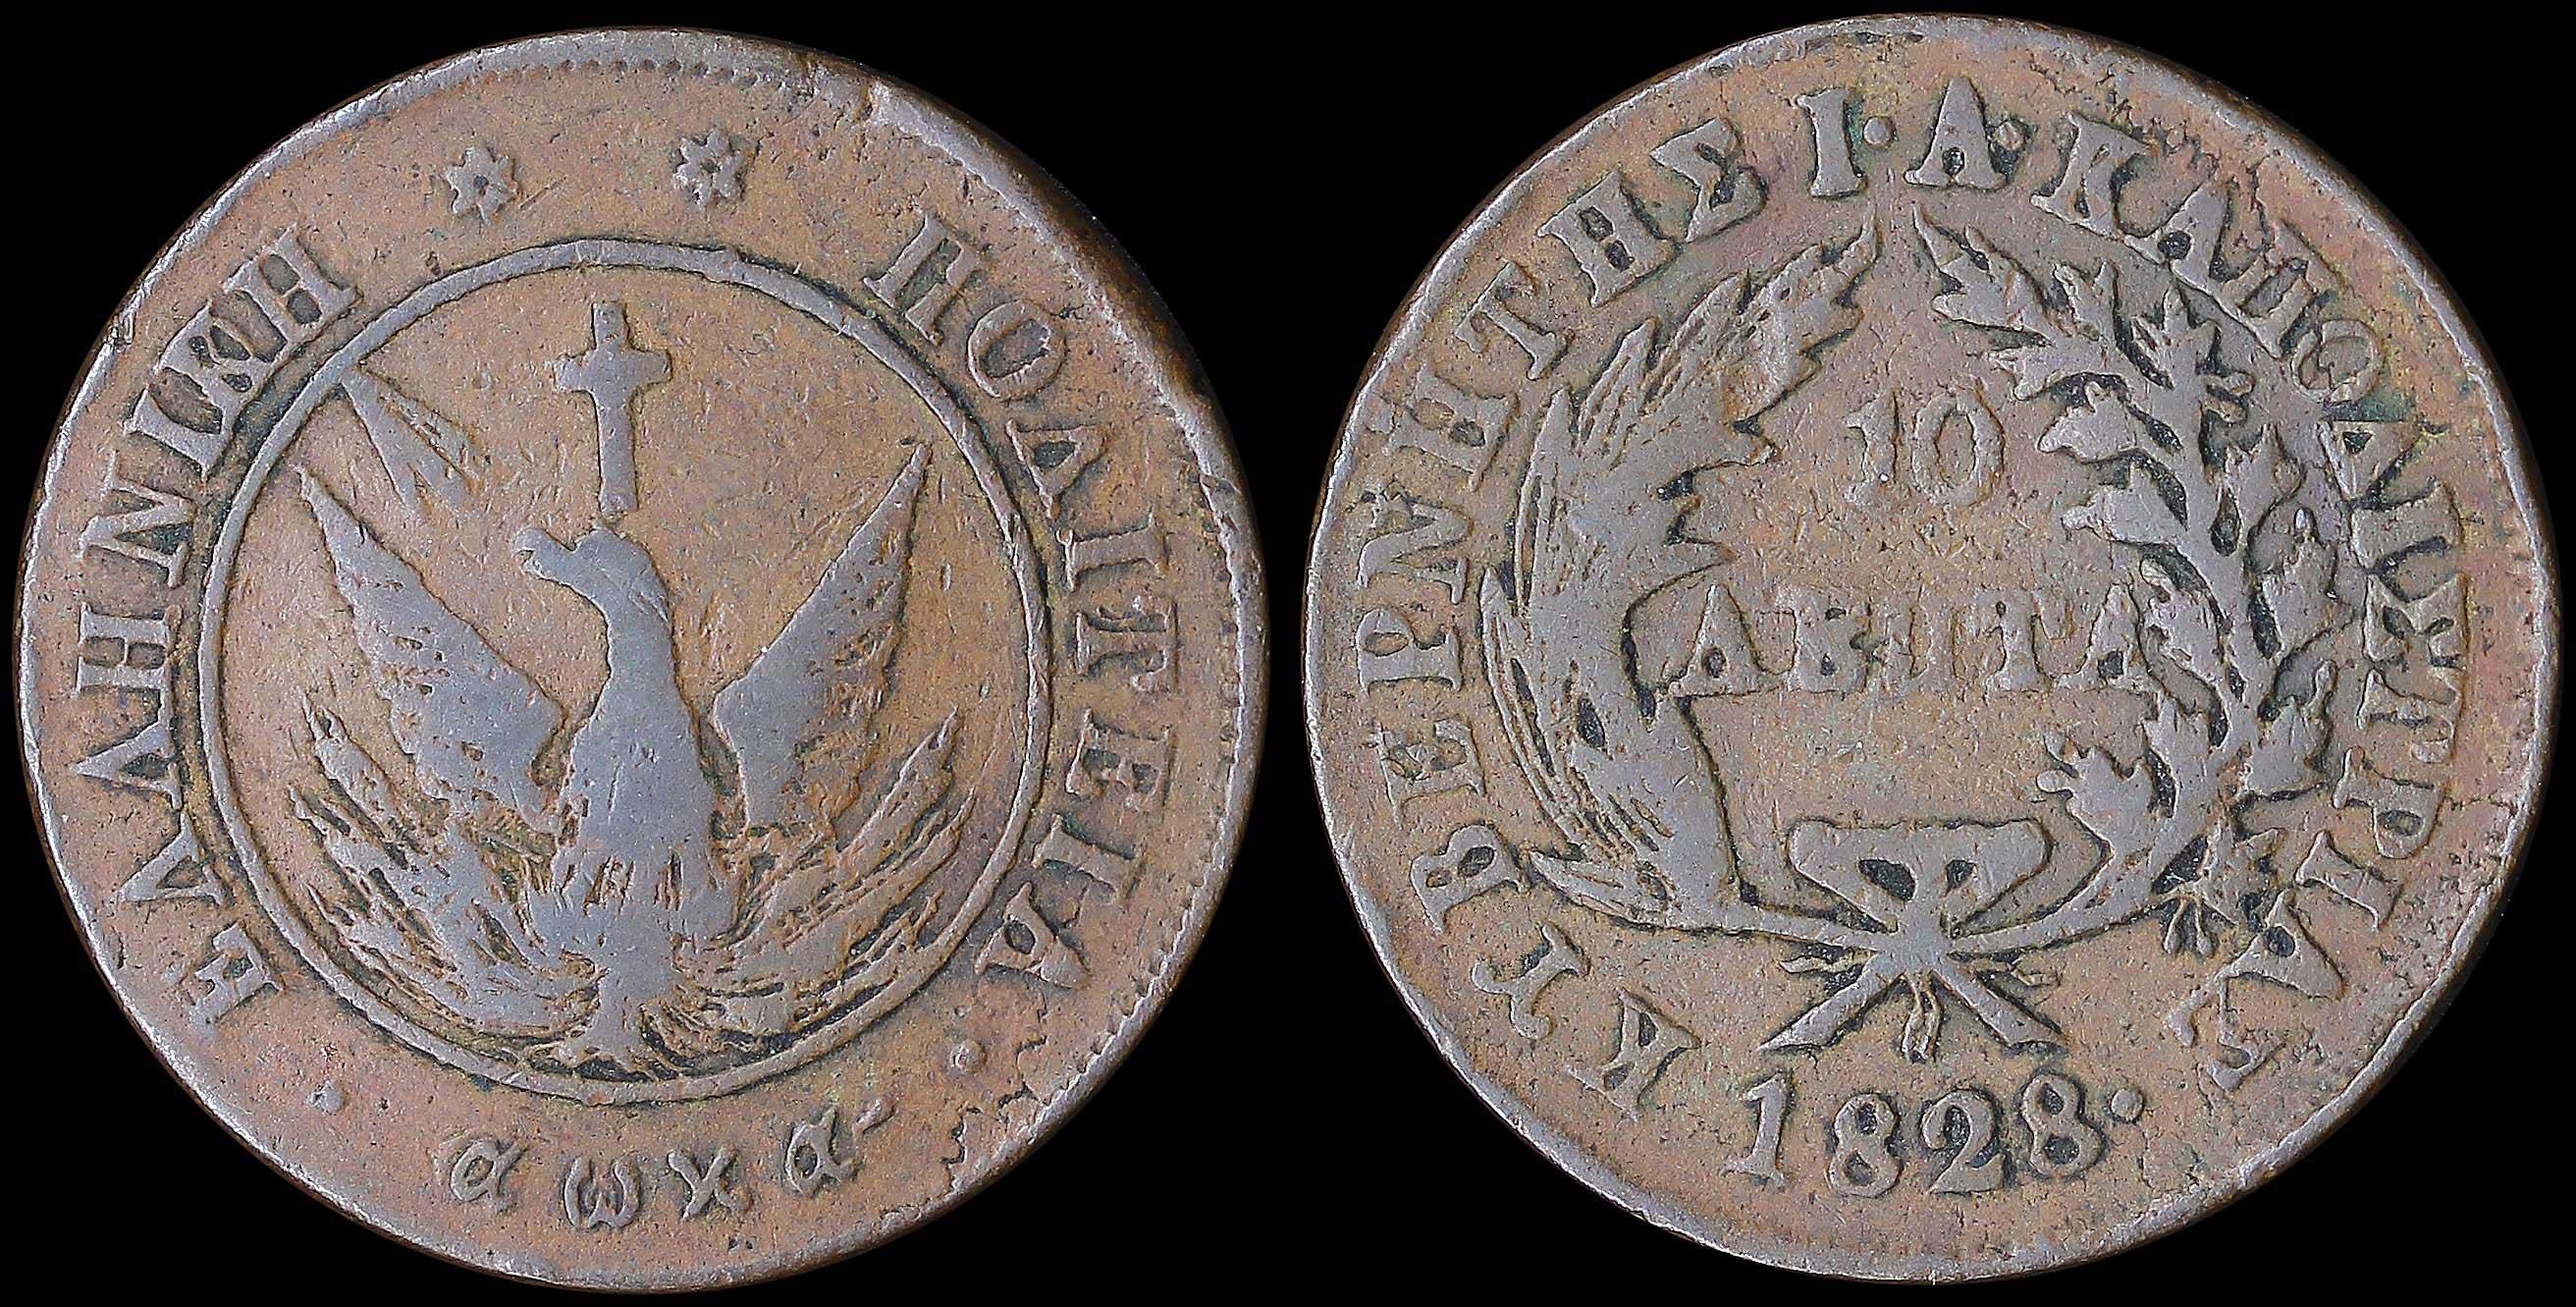 Lot 6013 - -  COINS & TOKENS governor capodistrias -  A. Karamitsos Public & Live Internet Auction 665 Coins, Medals & Banknotes